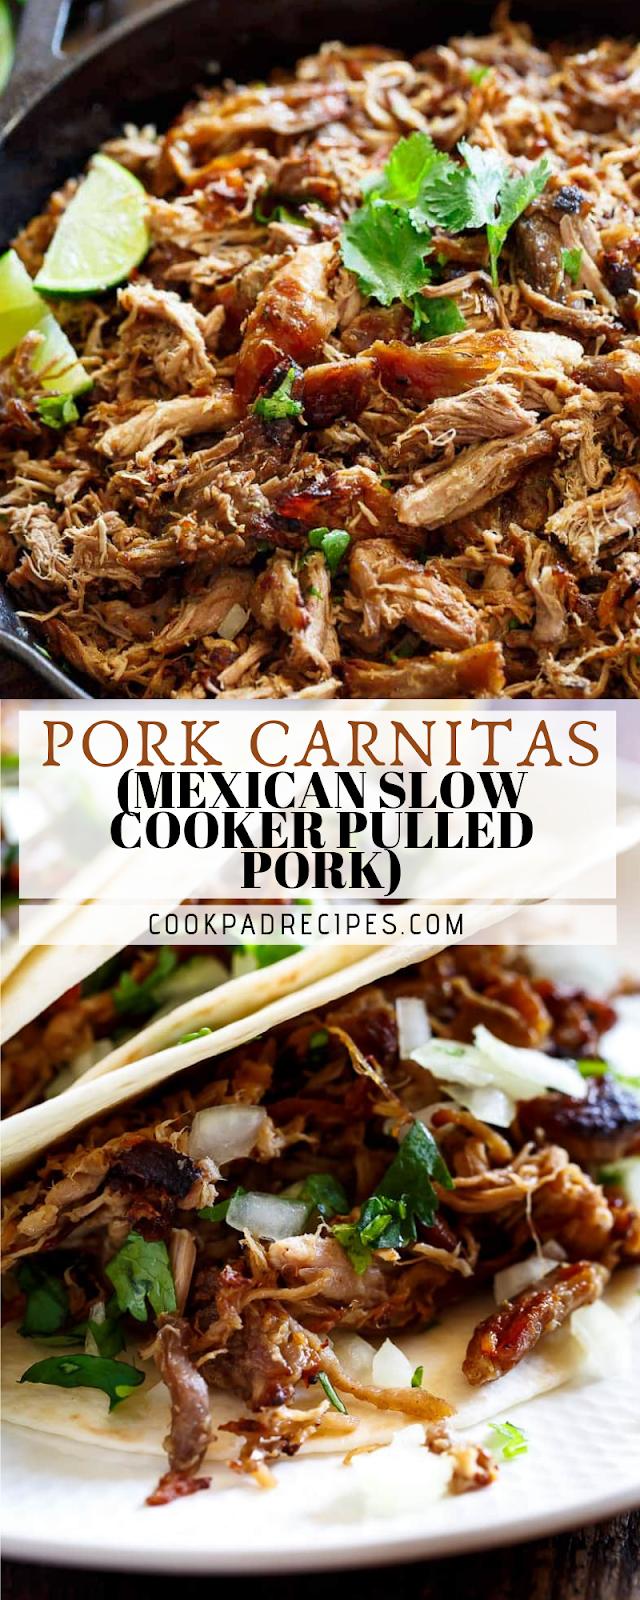 Pork Cаrnіtаѕ (Mеxісаn Slow Cooker Pullеd Pоrk)